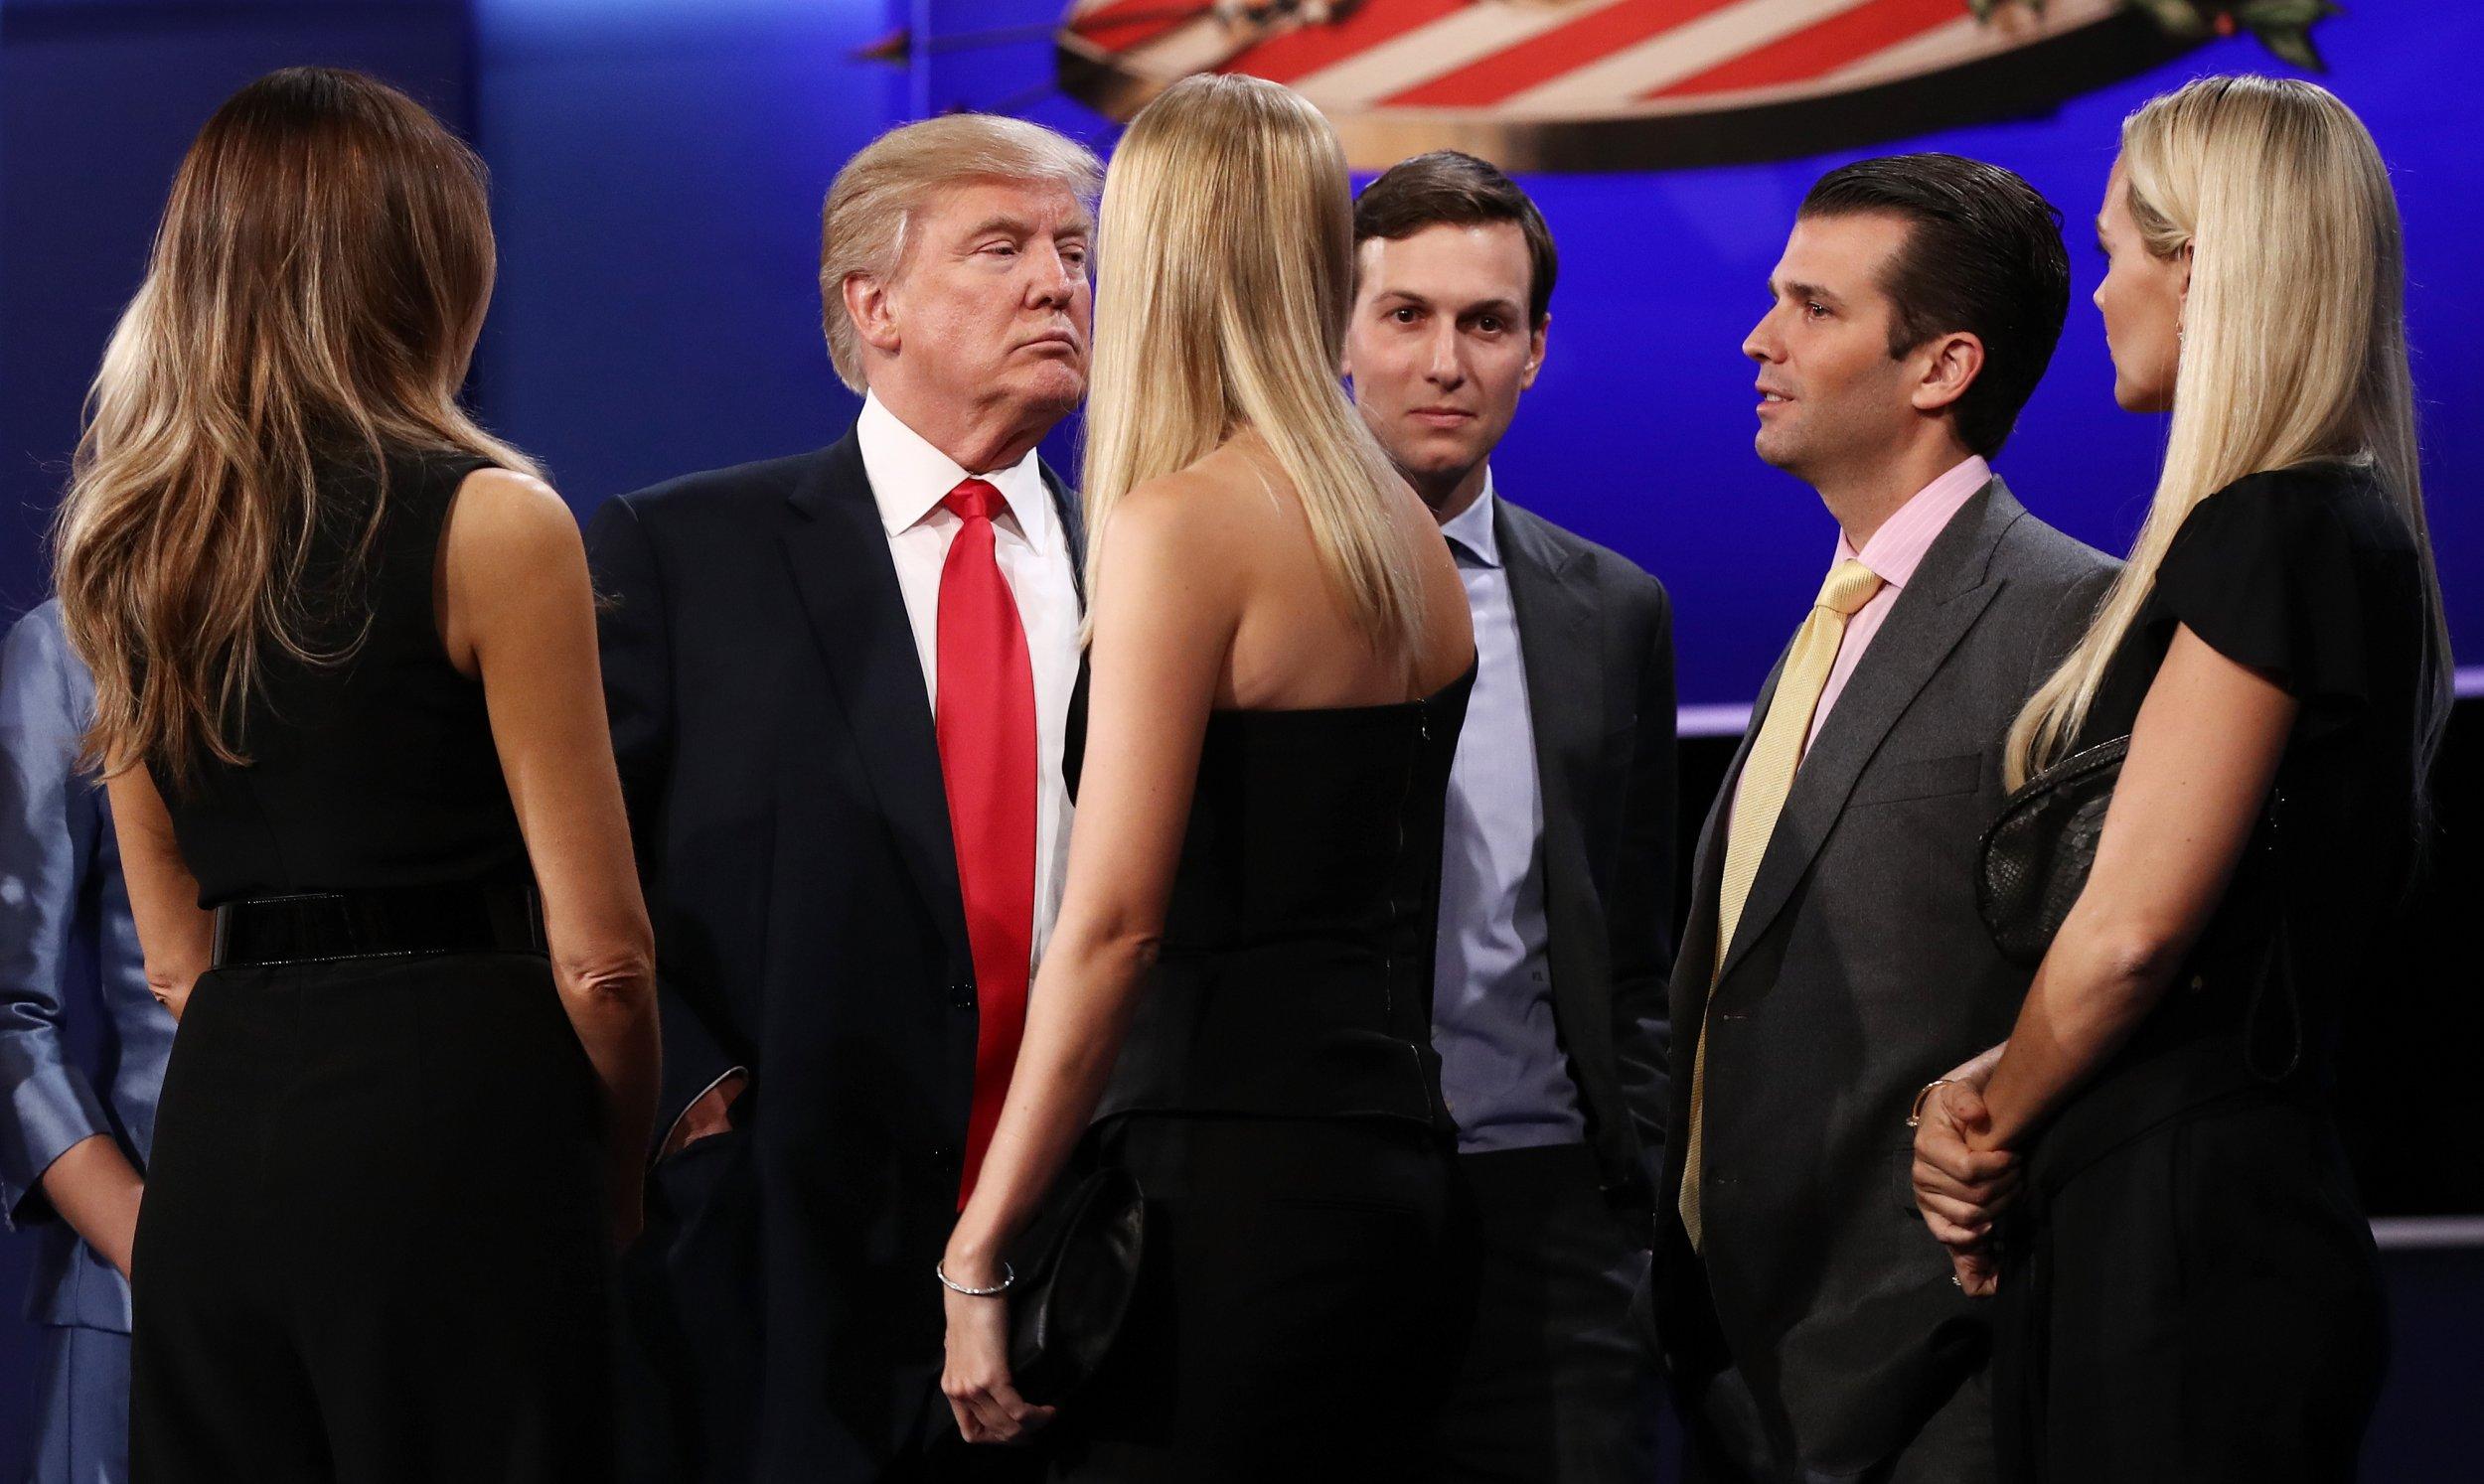 Donald Trump, Trump Jr, Jared Kushner,